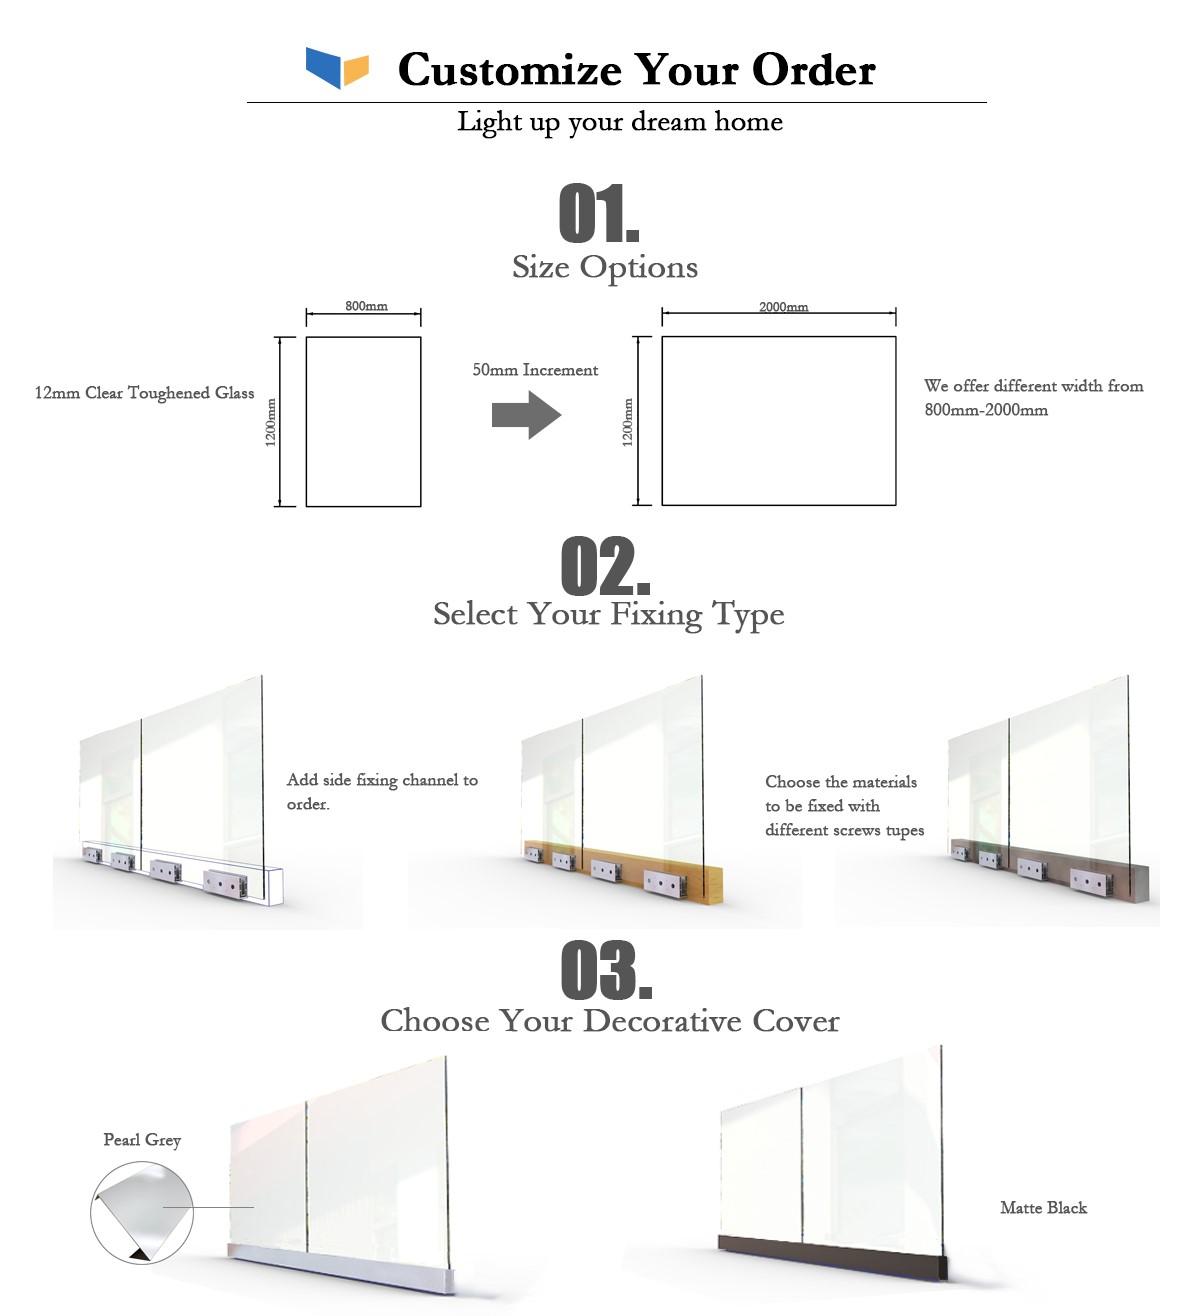 customize-your-order-31.jpg